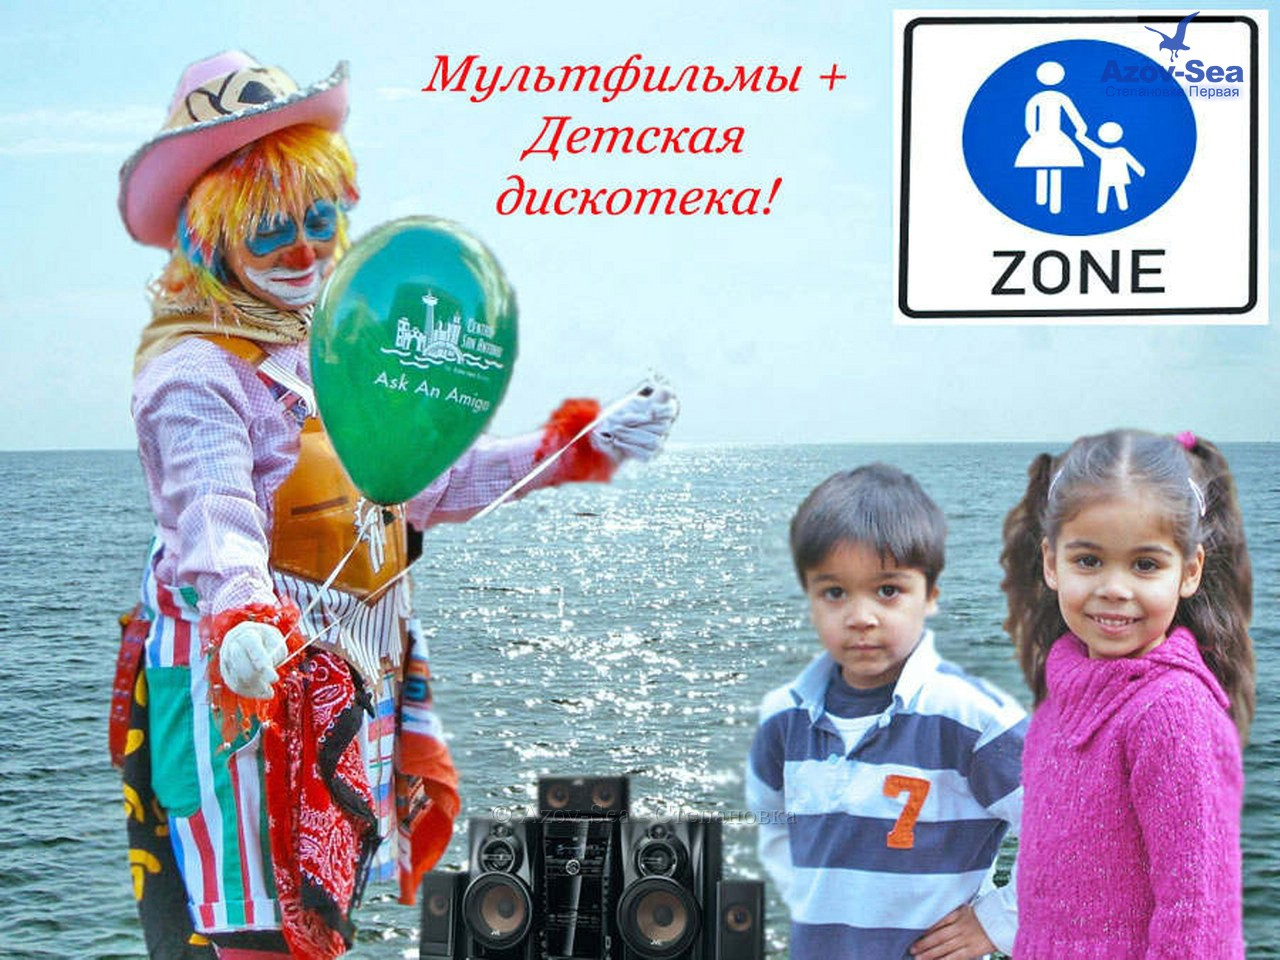 Аниматор и дети. Пансионат Степановка-Семейный. Степановка.